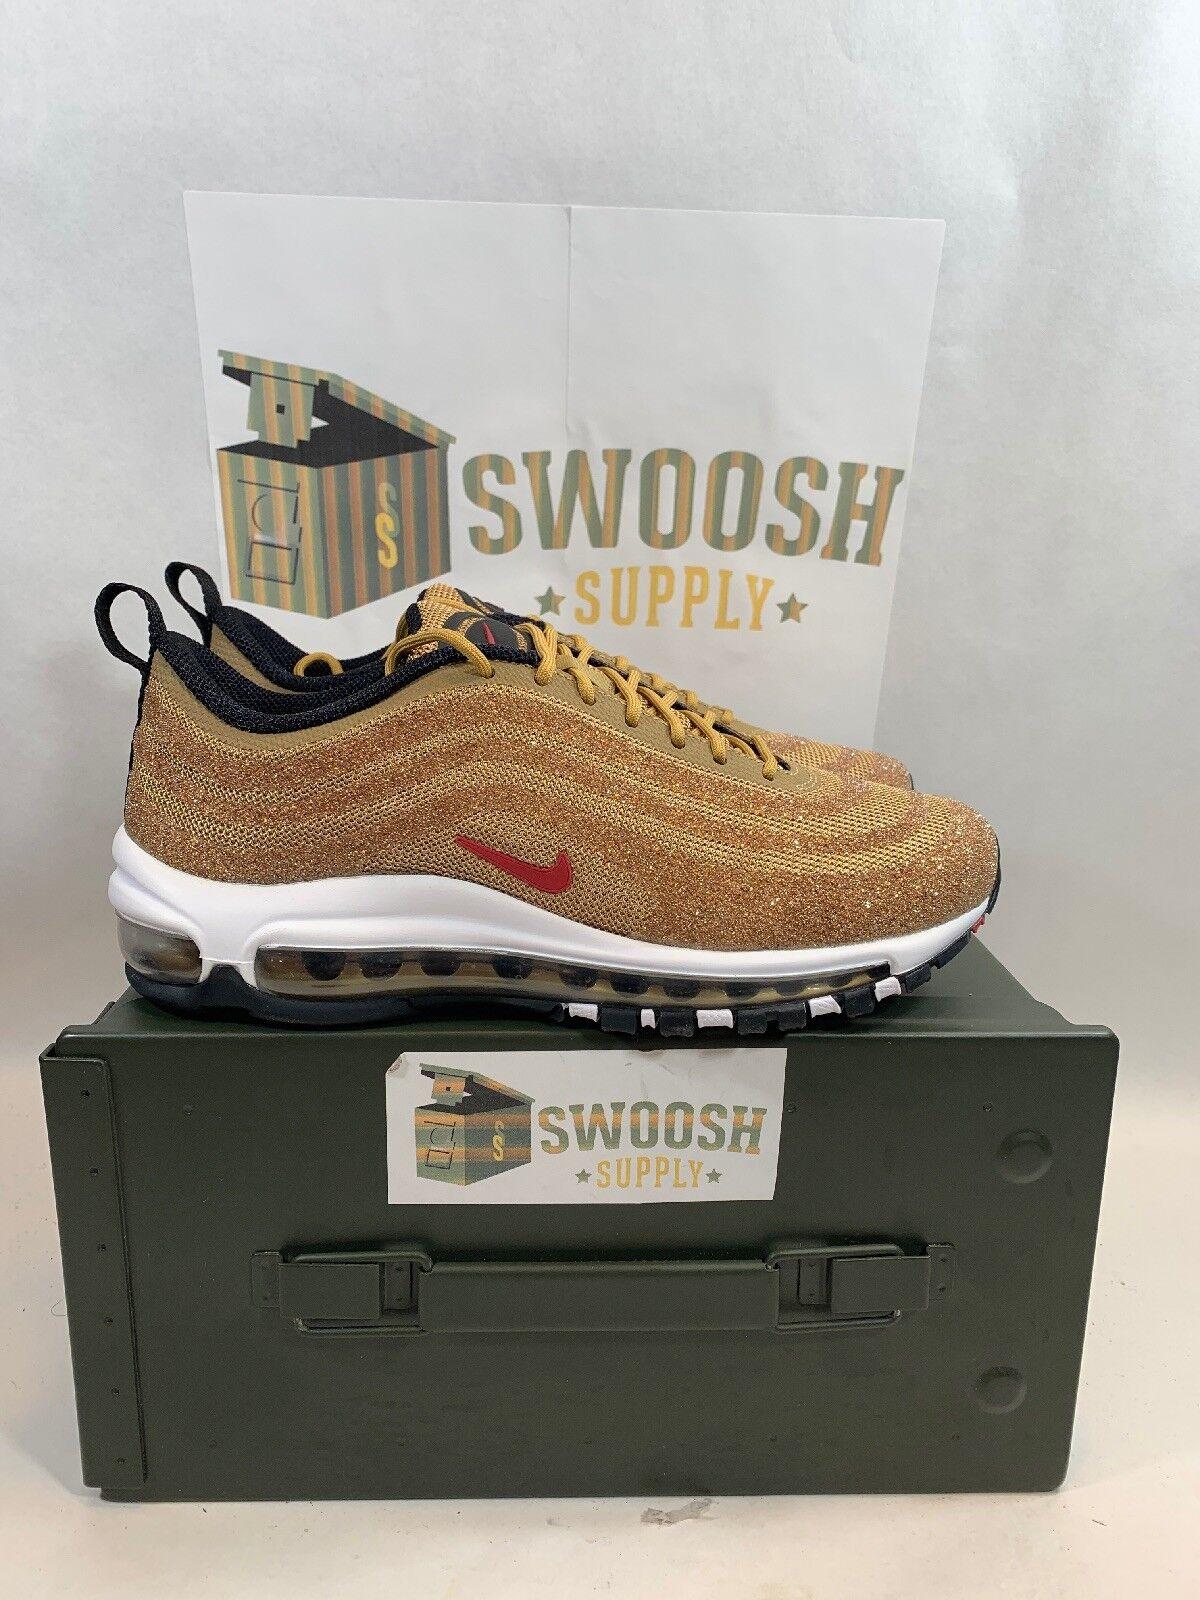 Nike Nike Nike kvinnor Swarovski Air Max 97 LXX Storlek 7.5 guld 927508 700  fri frakt och utbyte.